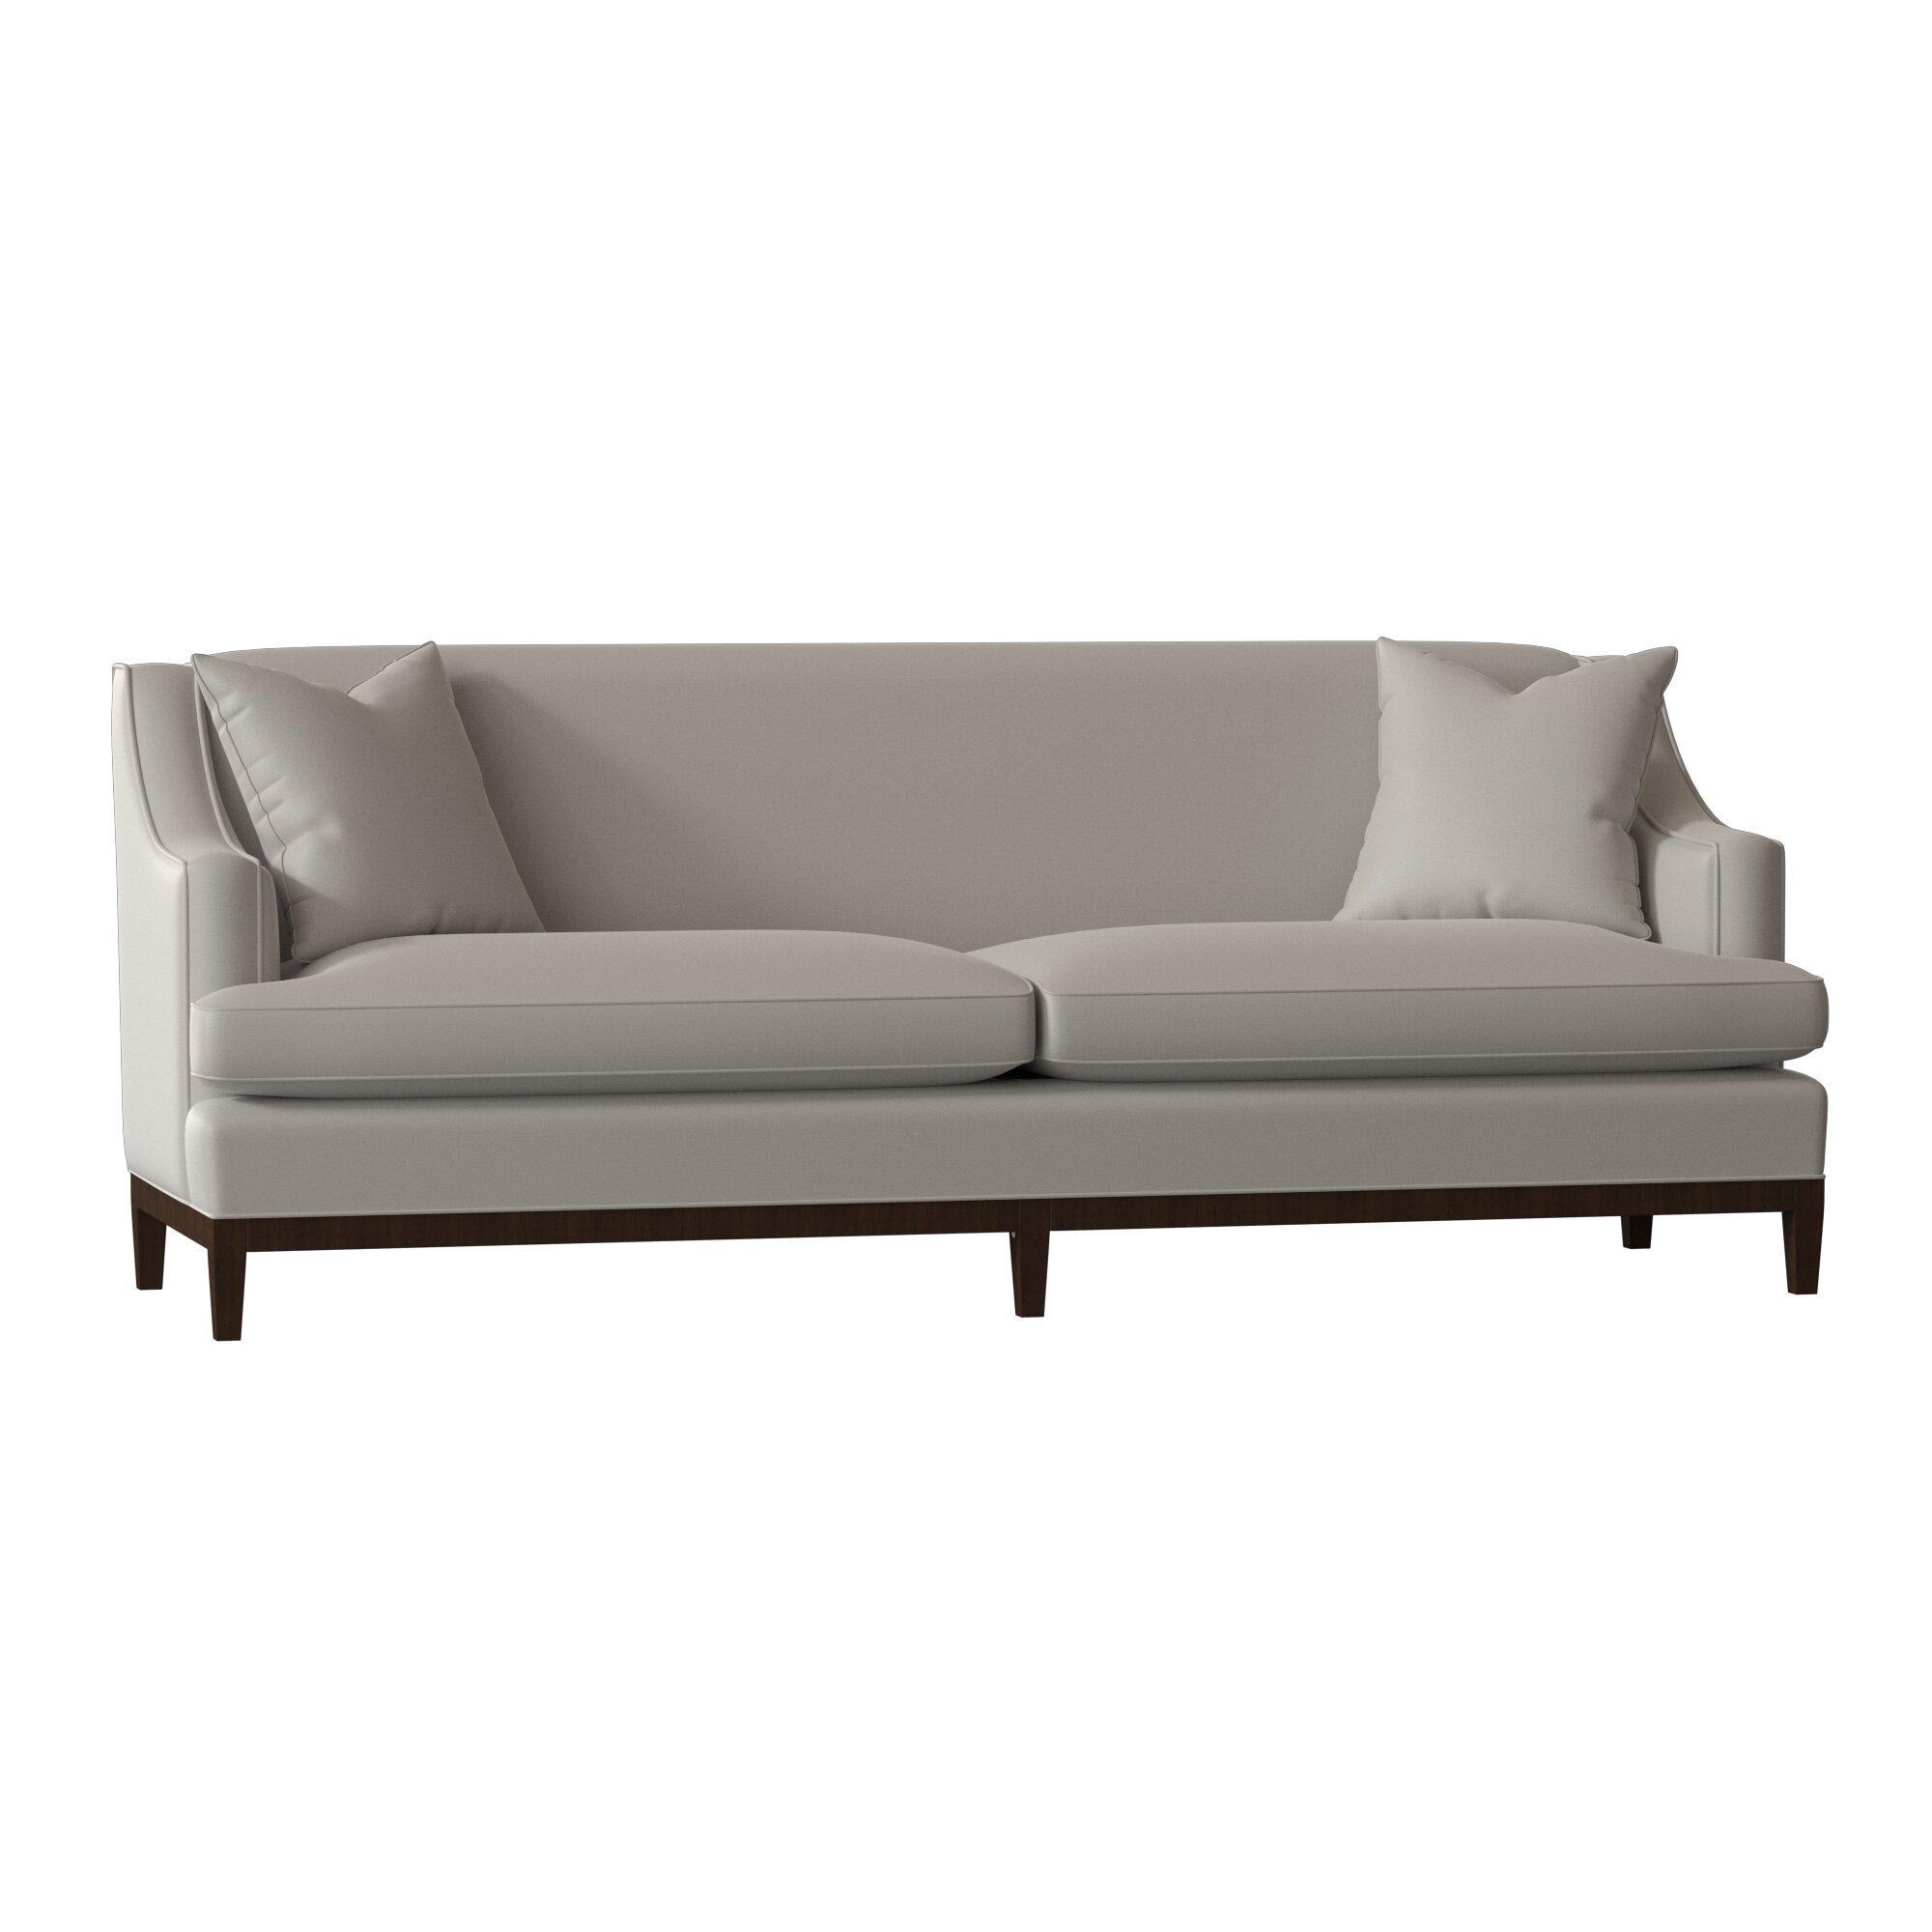 Duralee Furniture Cardiff Recessed Arm Sofa Wayfair